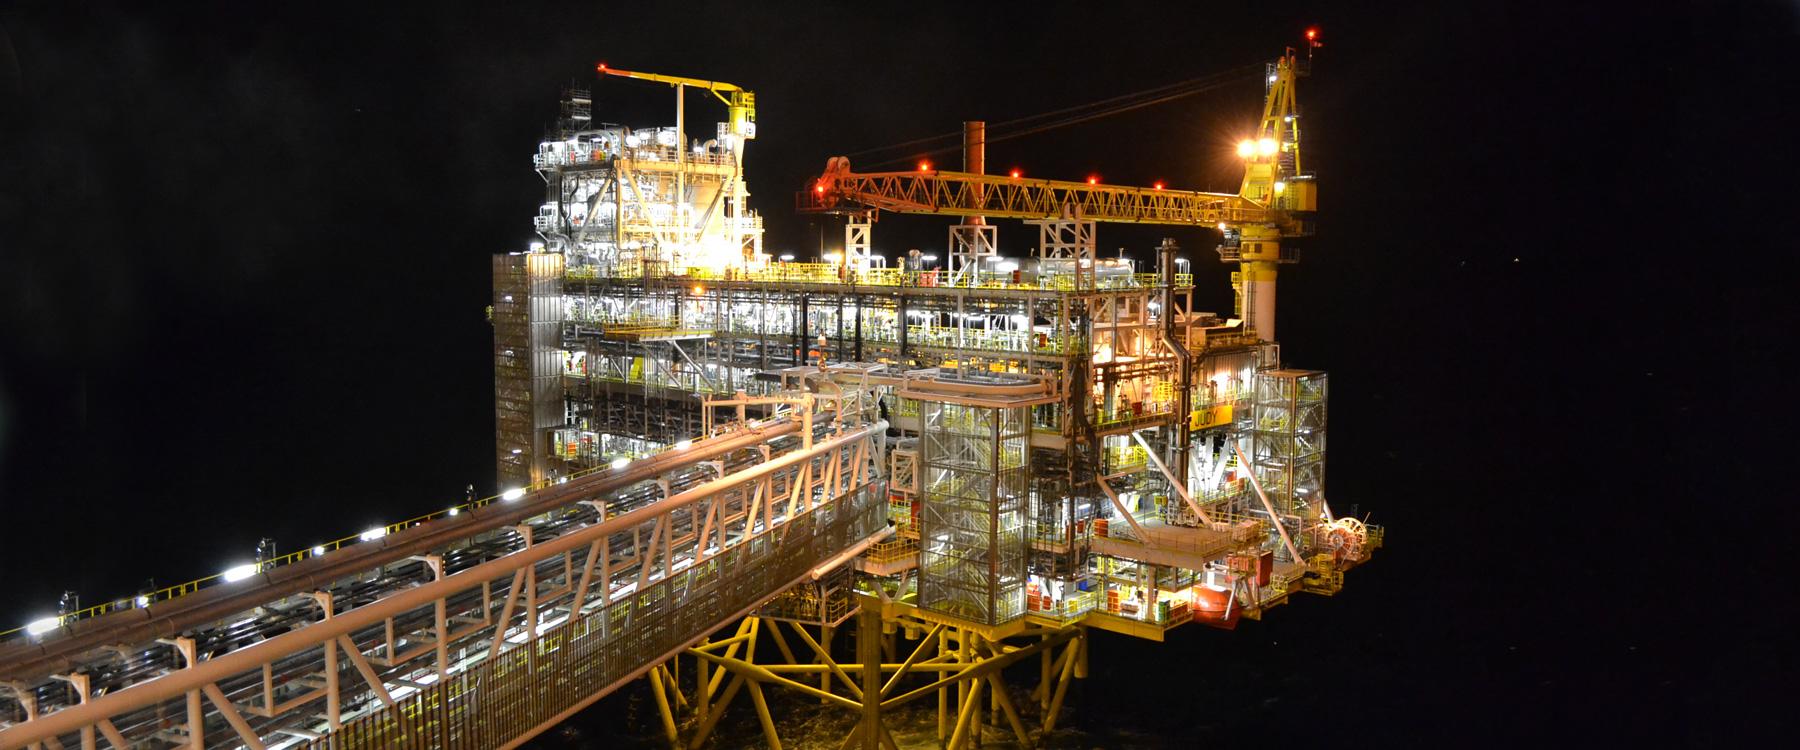 Rilievi impiantistici Oil & Gas, offshore e onshore Gaiagroup